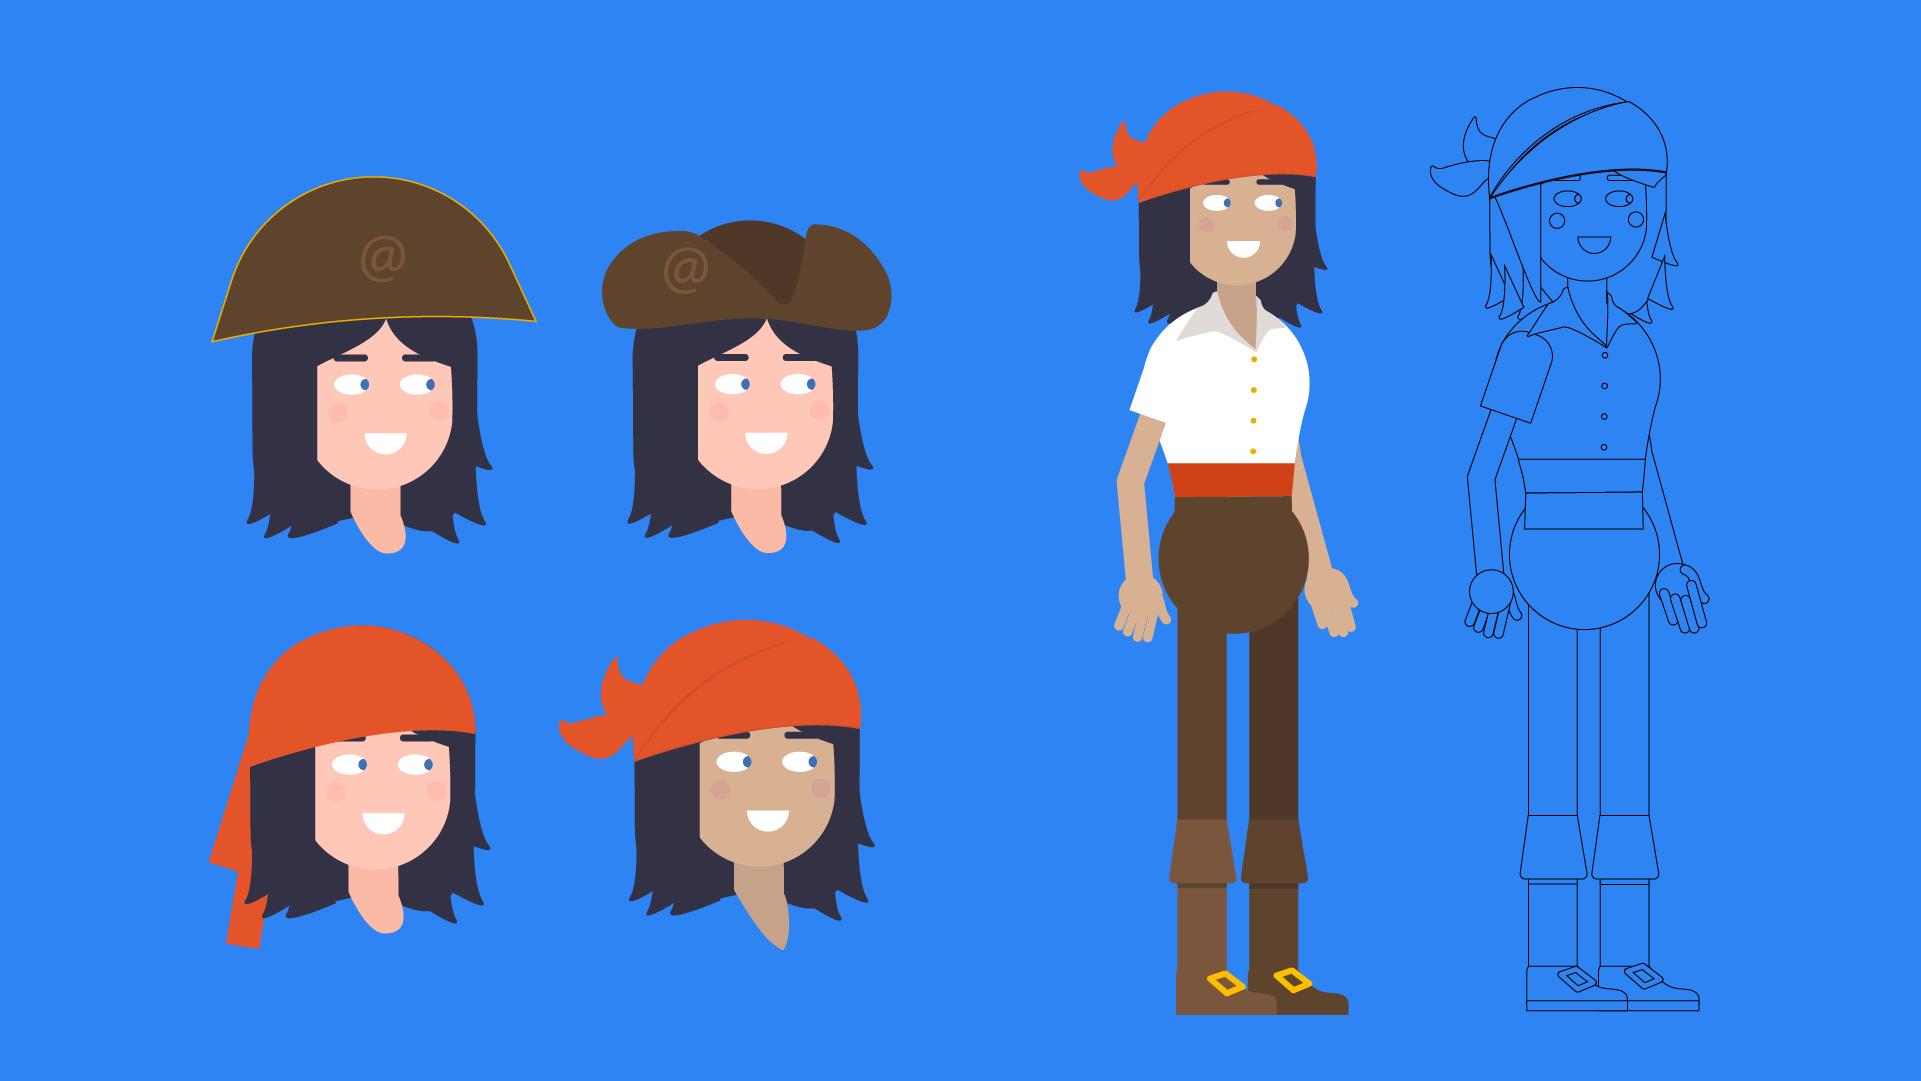 character_design-03